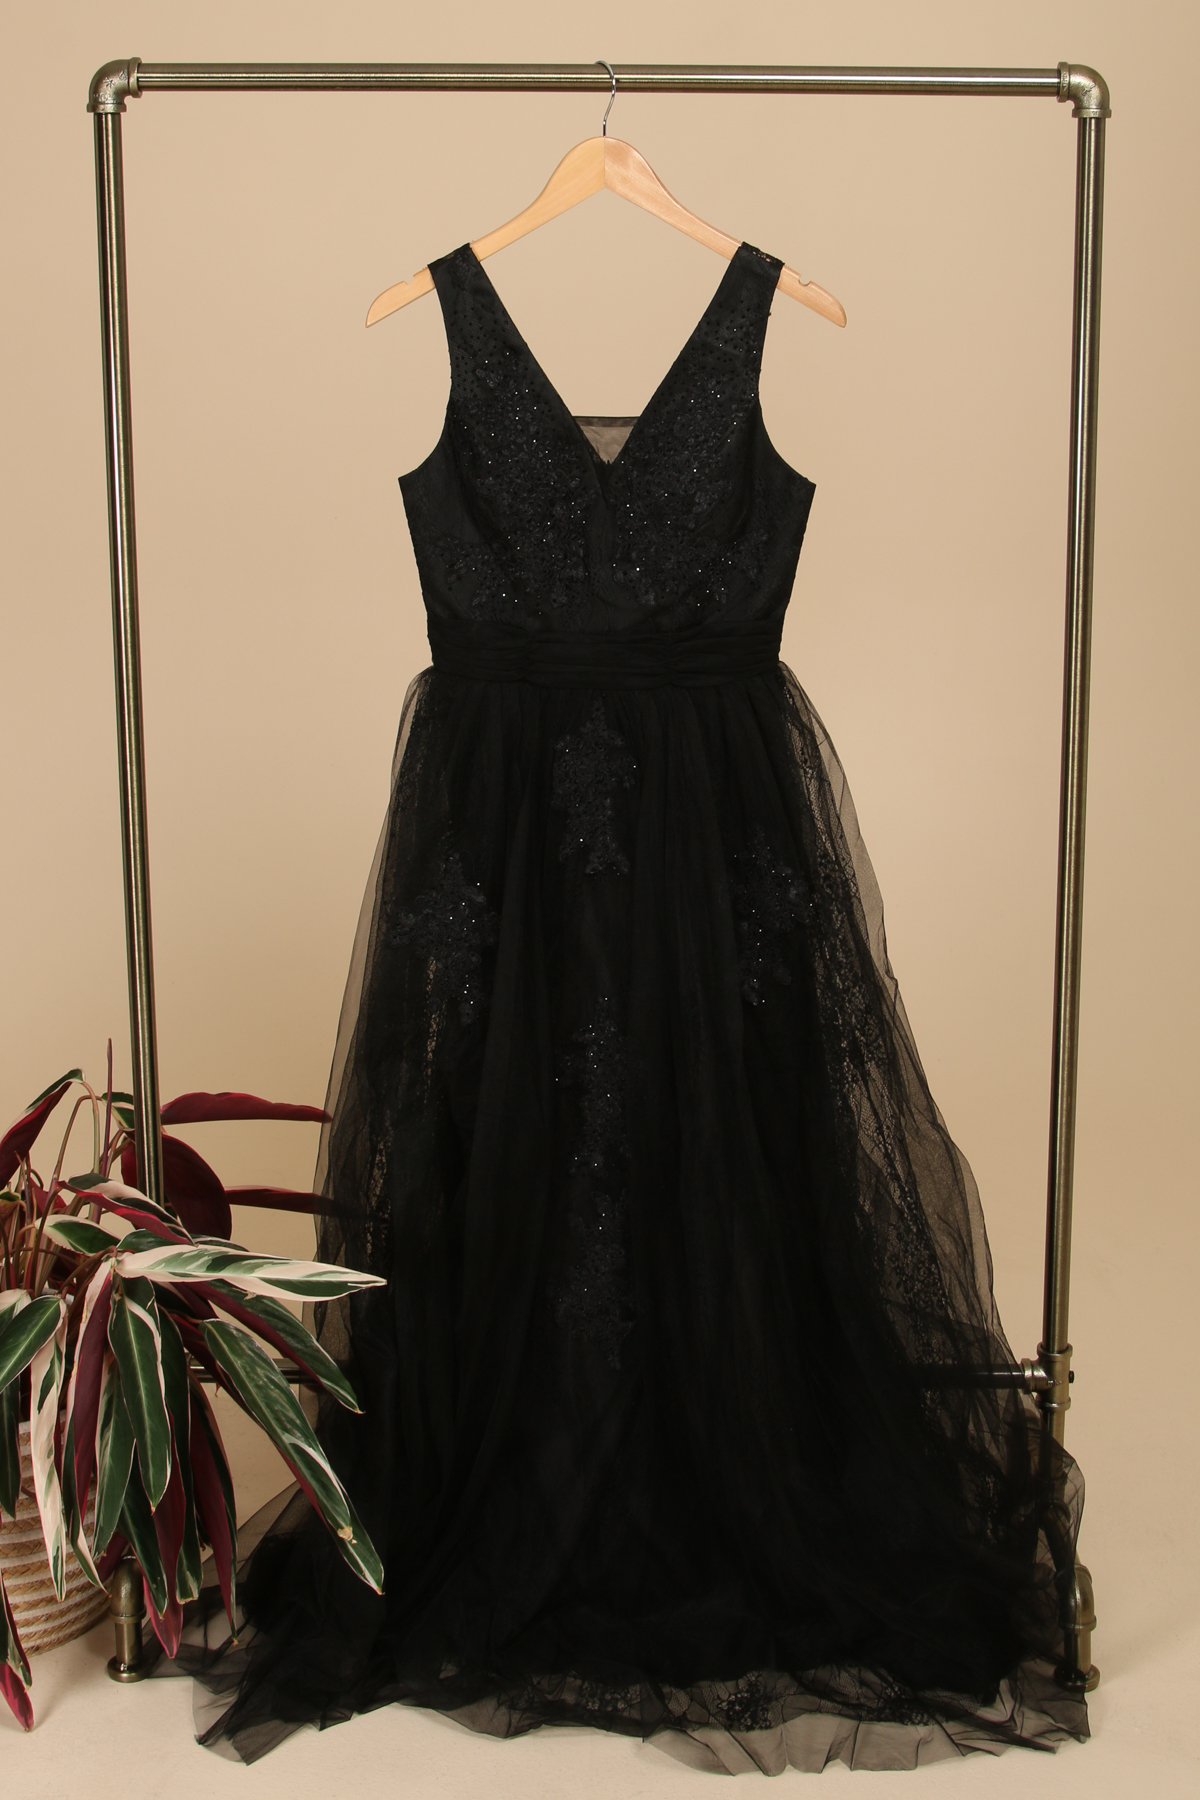 Abiti da sera Donna Black HD Diffusion 191165A #c eFashion Paris